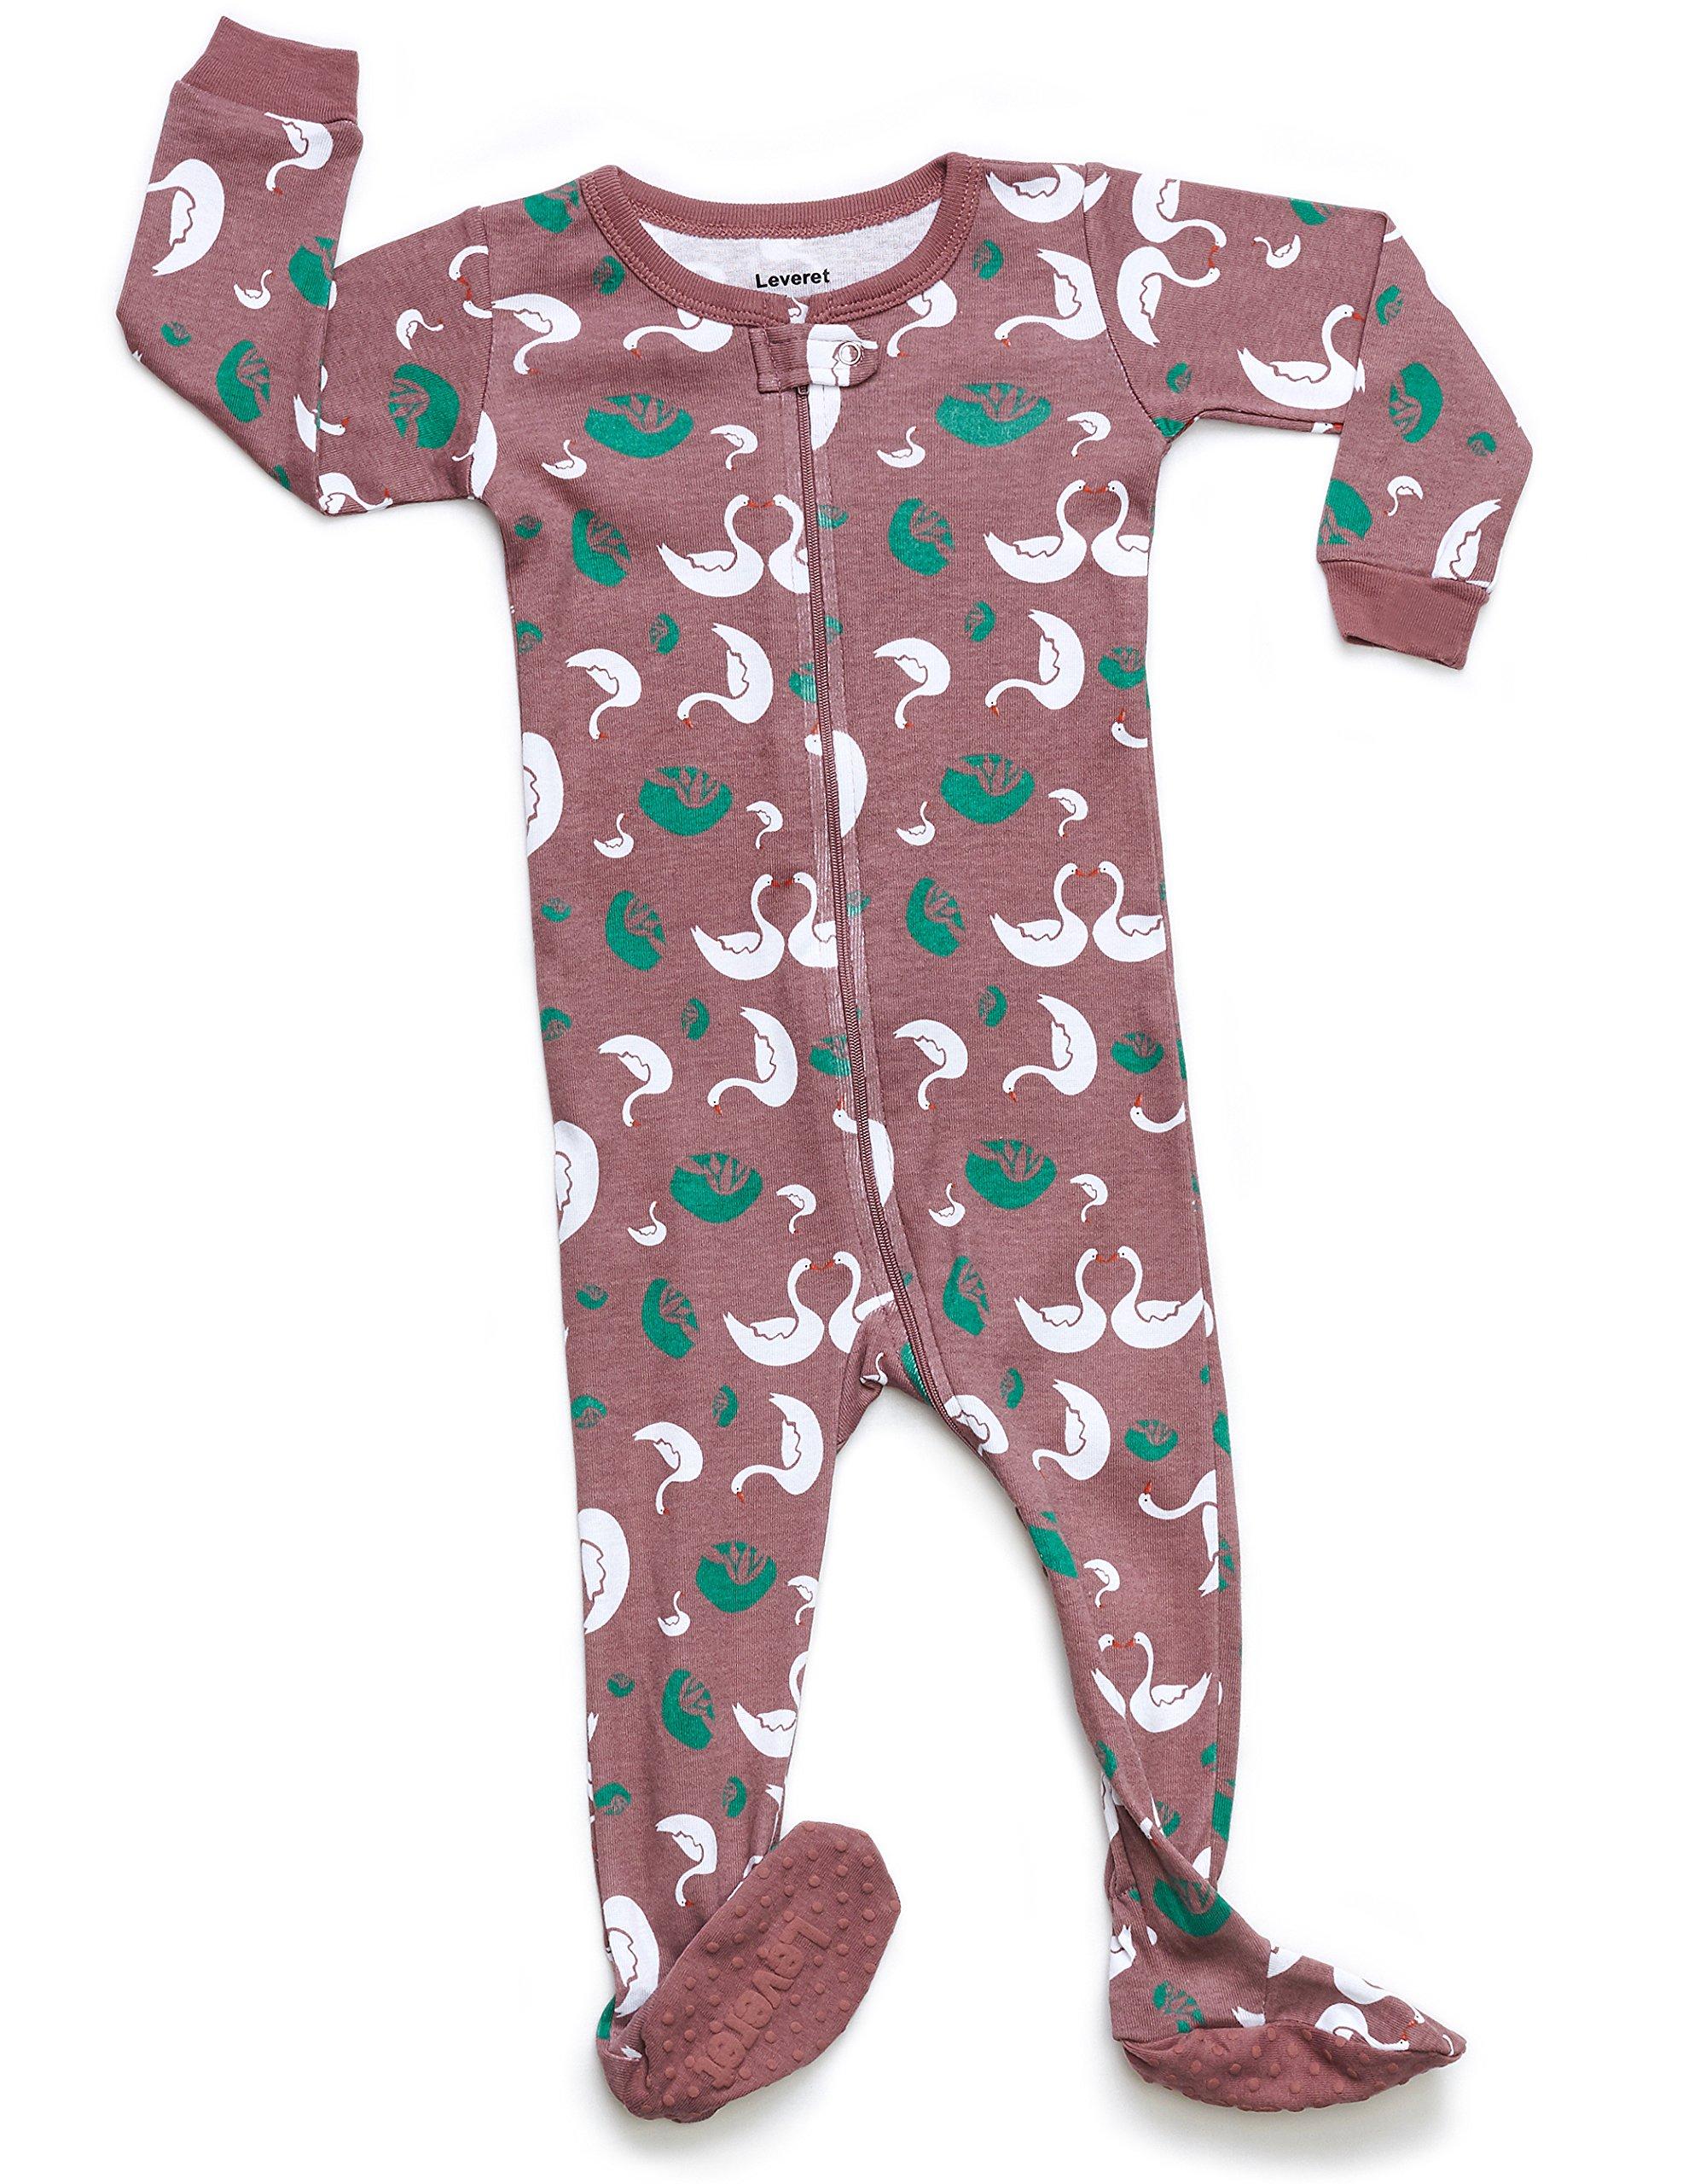 Leveret Organic Cotton Swan Footed Pajama Sleeper 4